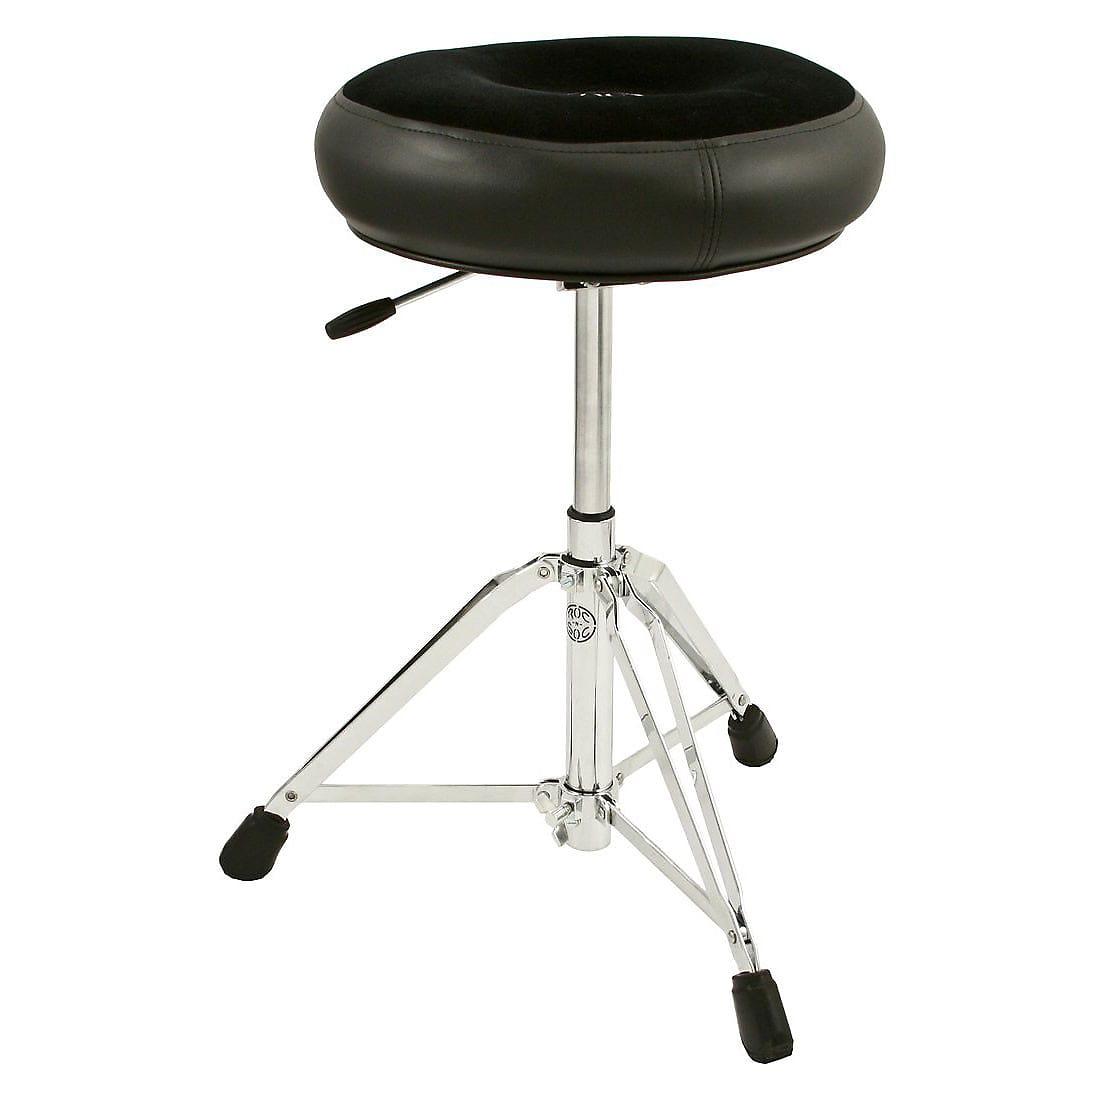 HDDT10 SJC Custom Drums SJC Heavy Duty Round Seat Throne